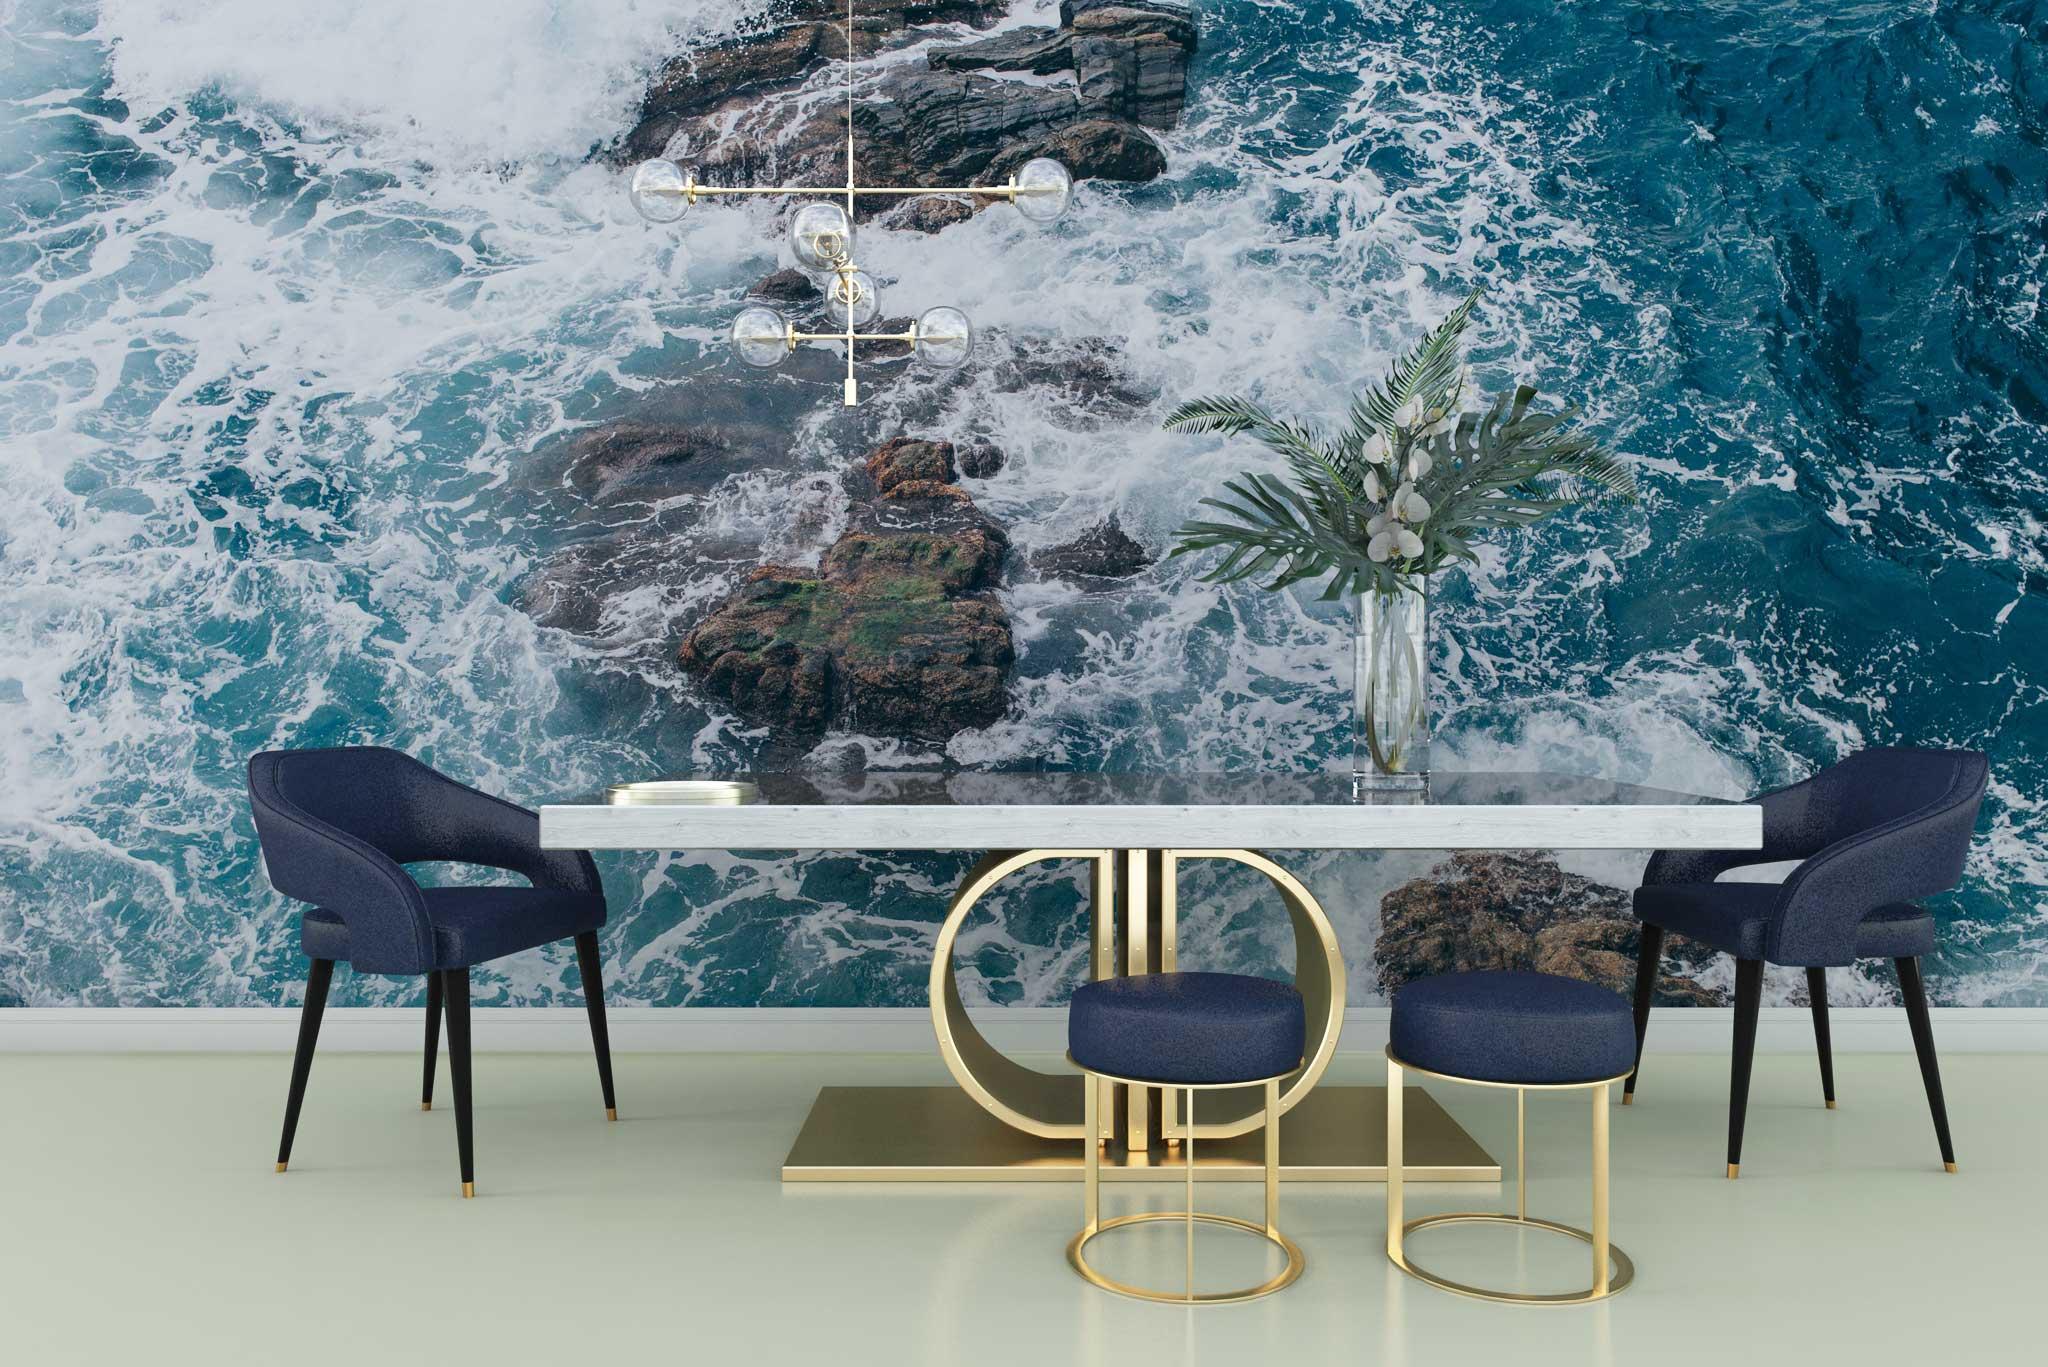 tapet-fototapet-personalizat-comanda-bucuresti-model-fotografie-ocean-mare-valuri-stanci-perete-lux-special